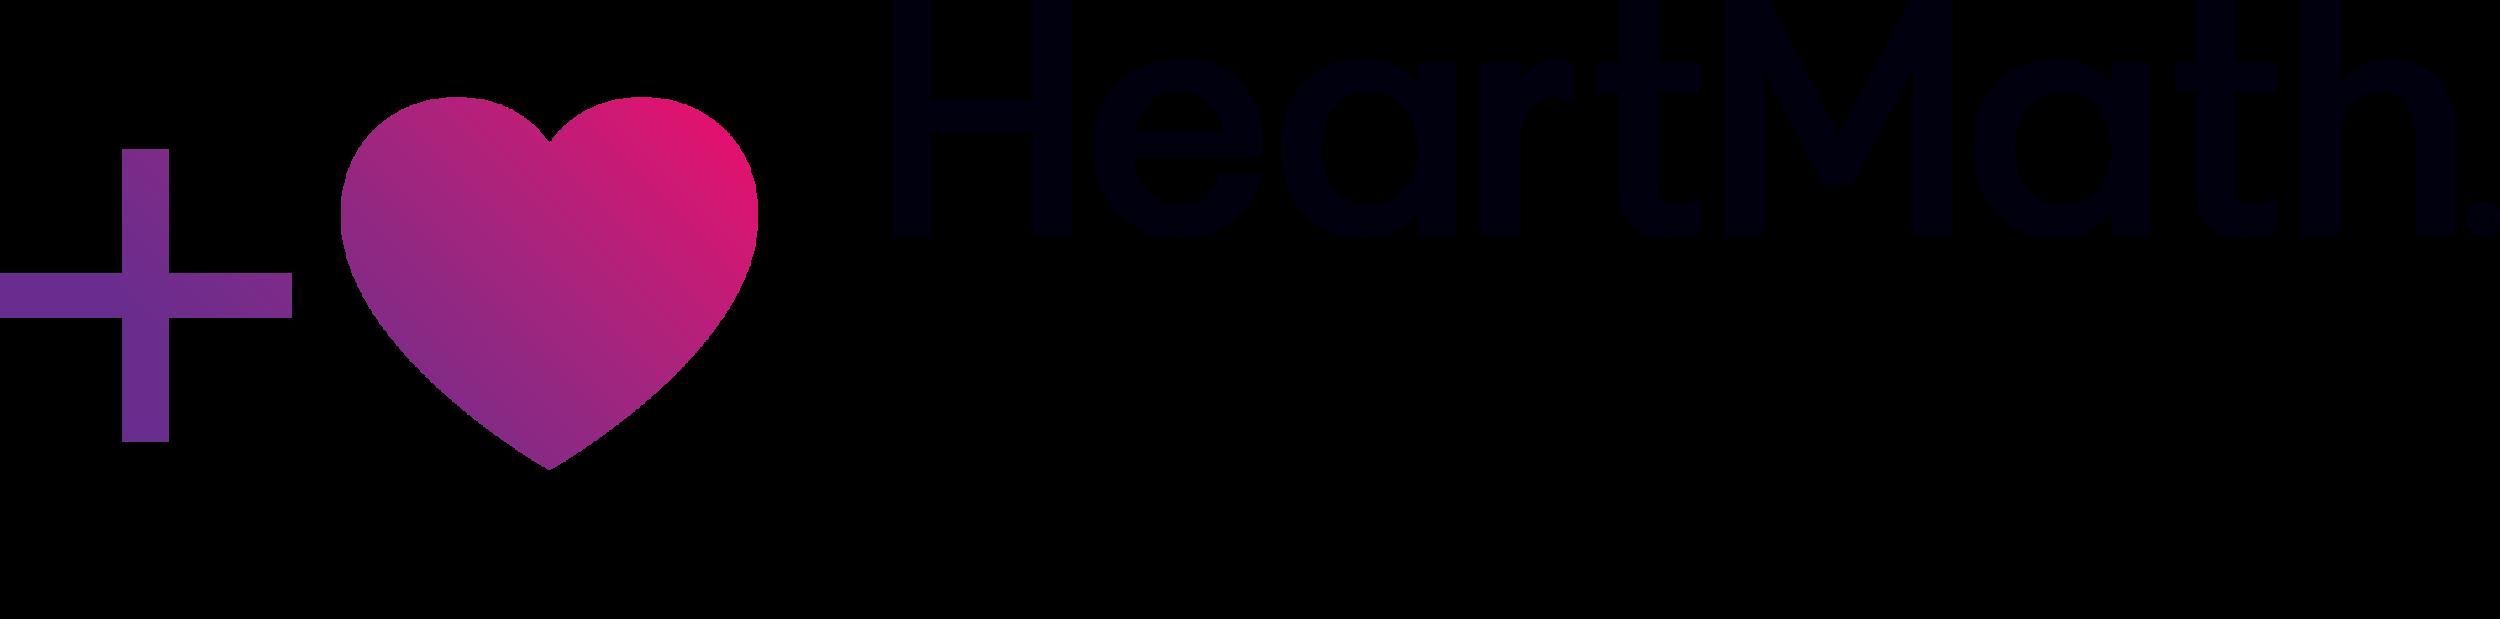 LOGO 2 HEARTMATH.png